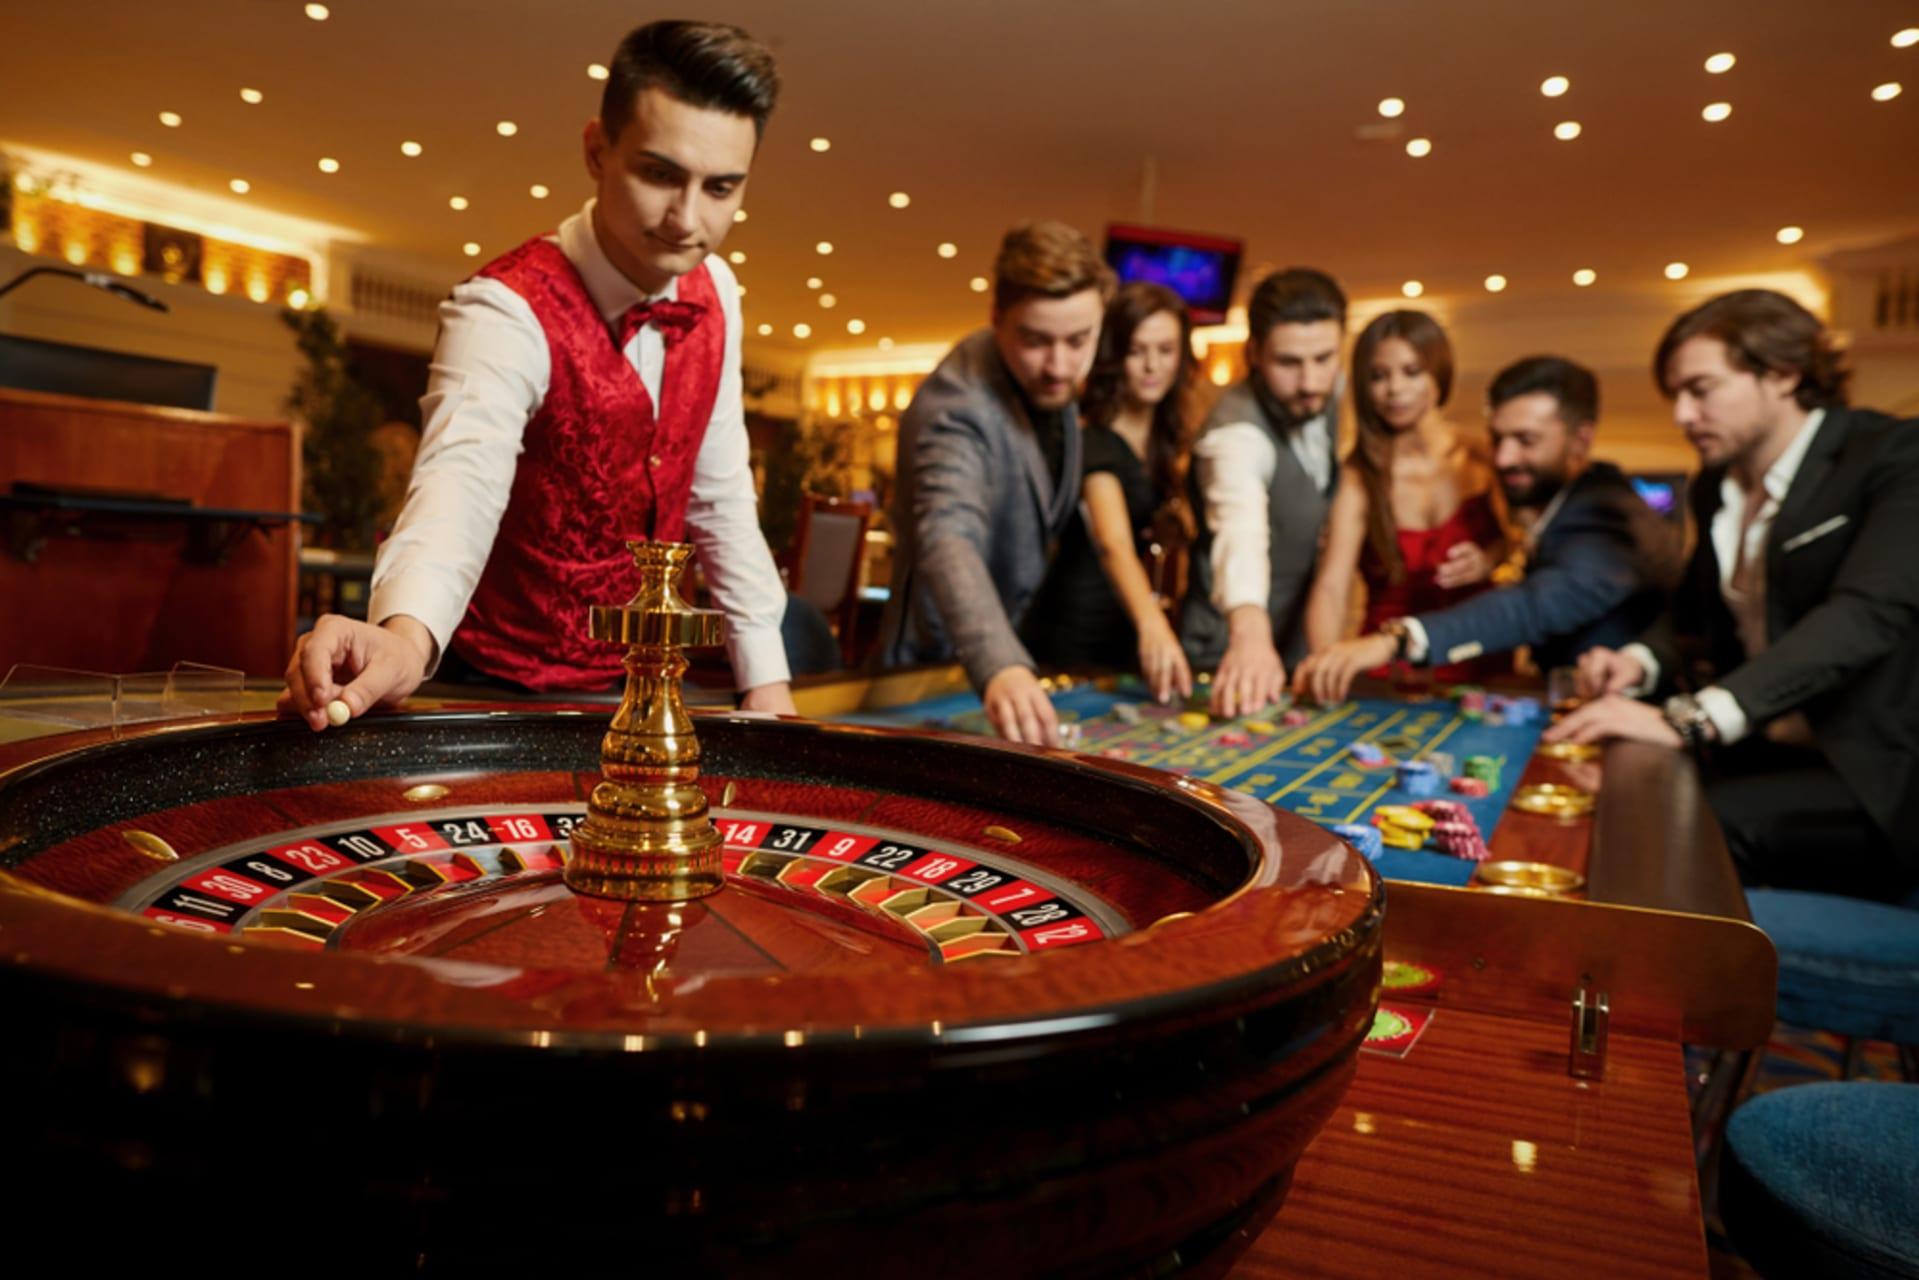 Heygo - Las Vegas - Casino Roulette Tips and Tricks